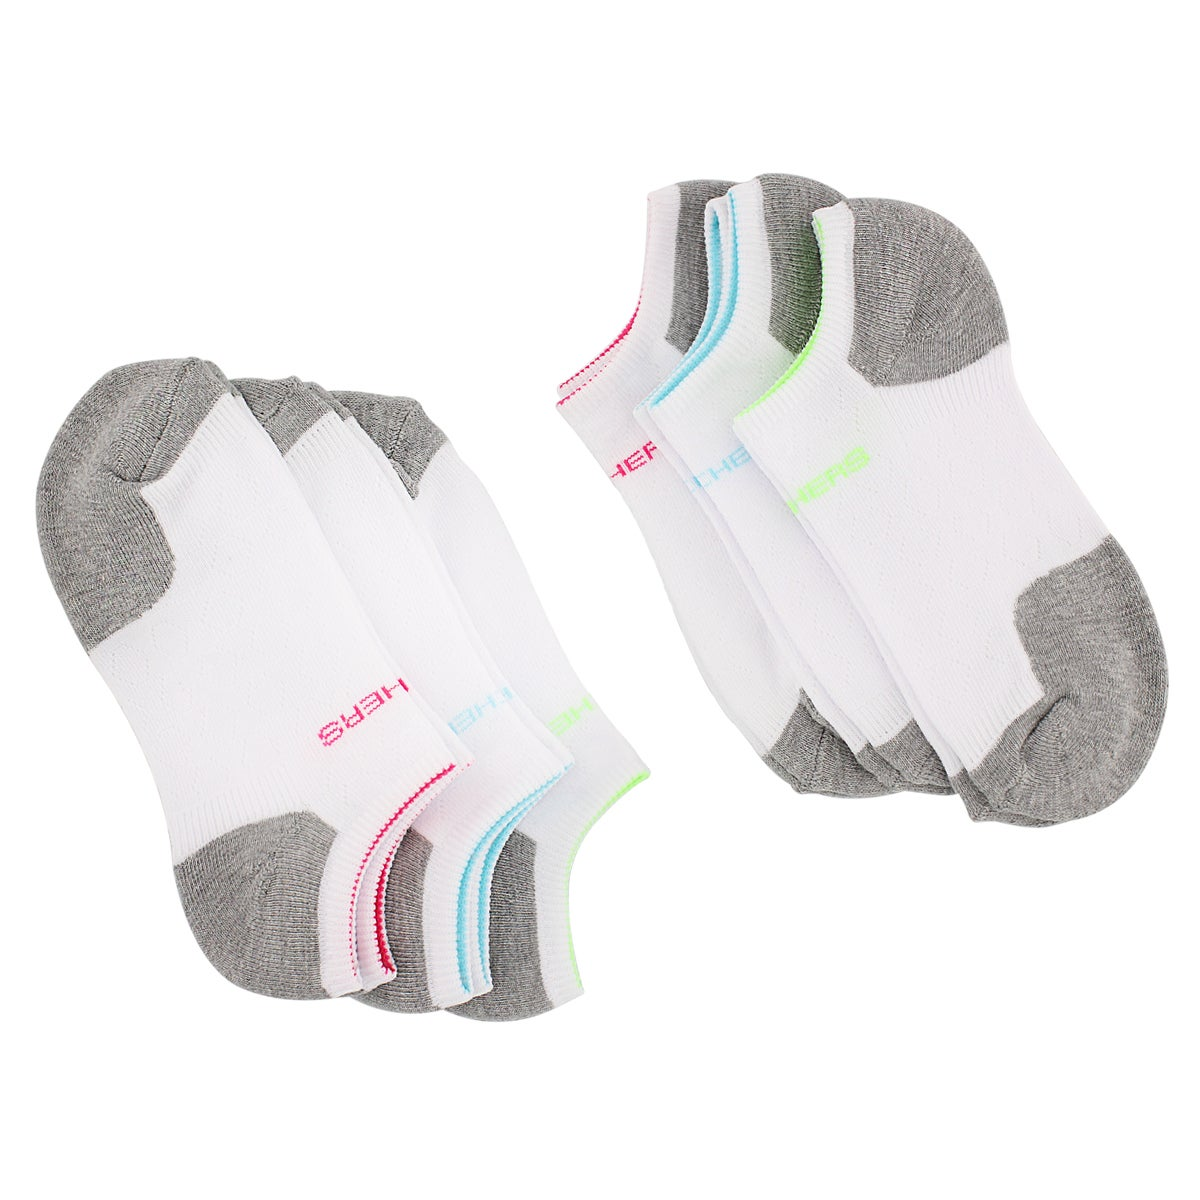 Socquettes SelectCushion, blc/rs, fem-6p